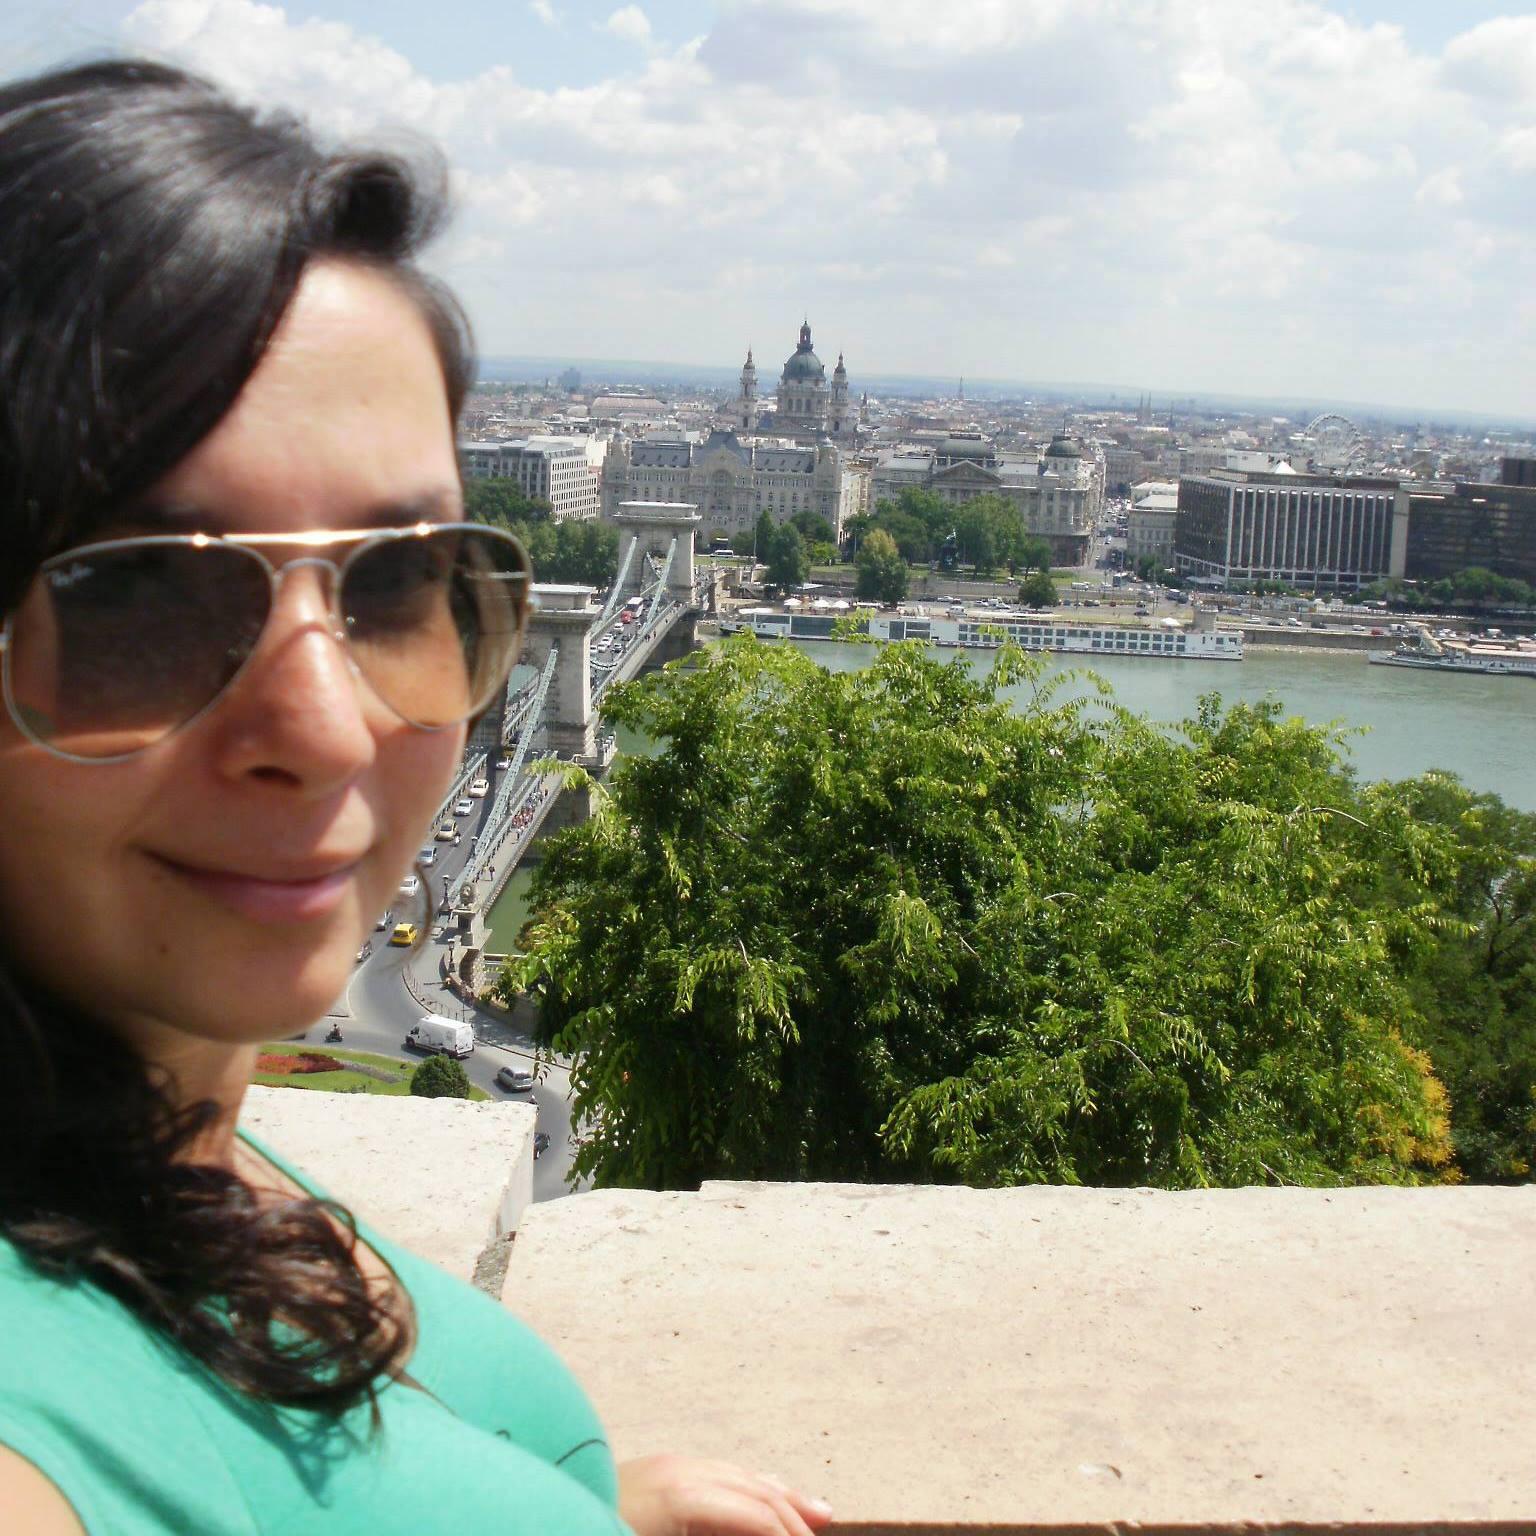 Rosa Vásquez Rodríguez